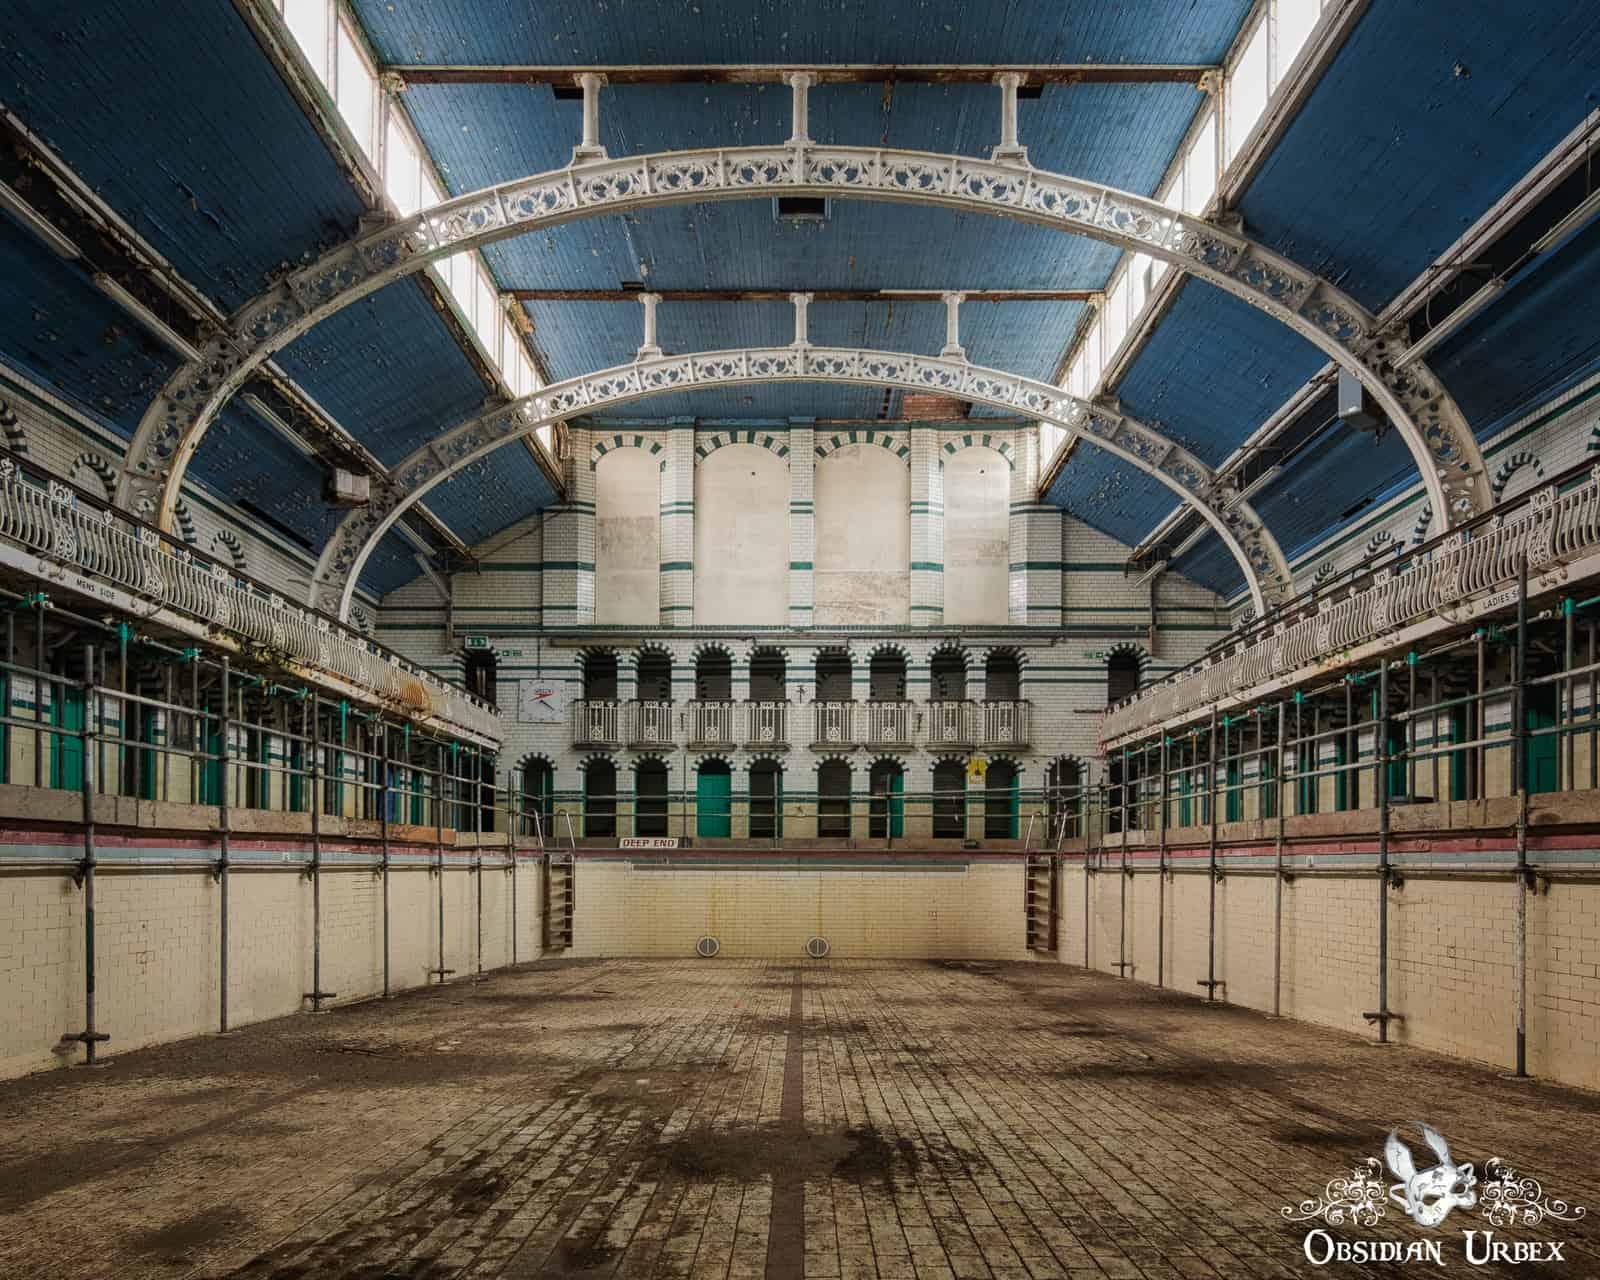 Moseley Road Baths England Obsidian Urbex Photography Urban Exploration Abandoned Places